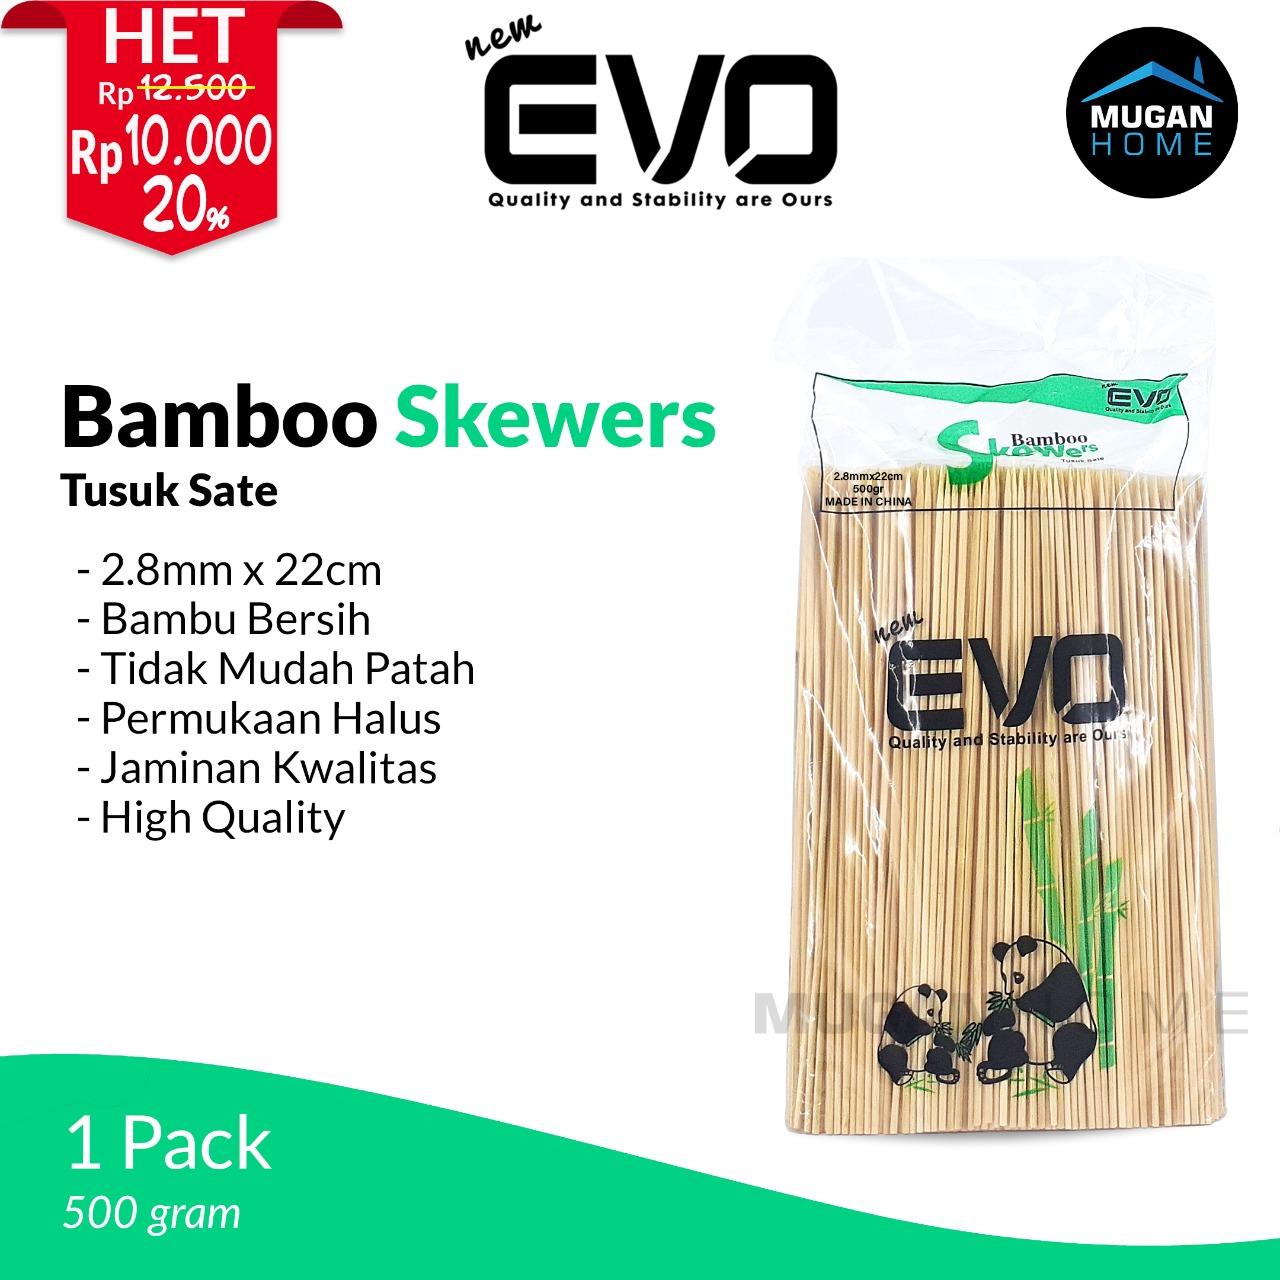 BAMBOO SKEWERS NEW EVO 500GRAM 2.8MM*22CM